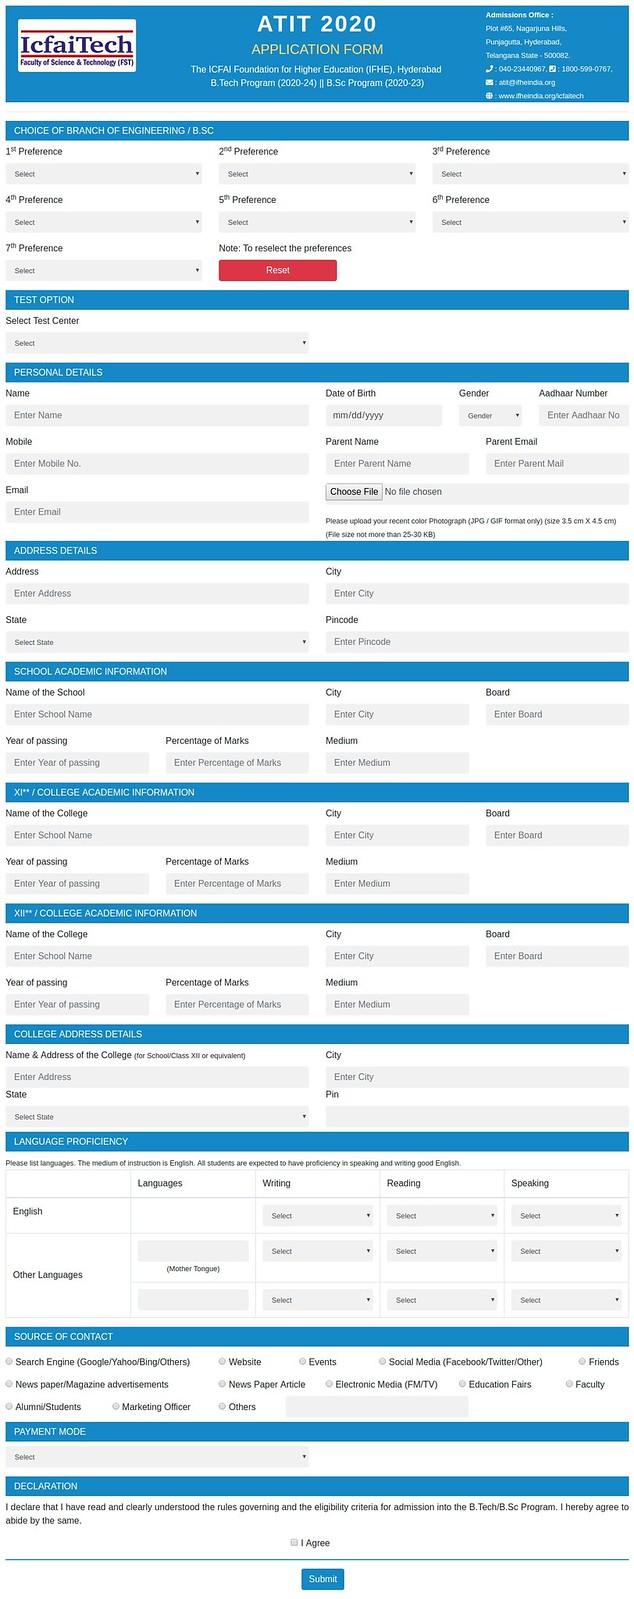 ATIT 2020 Application Form